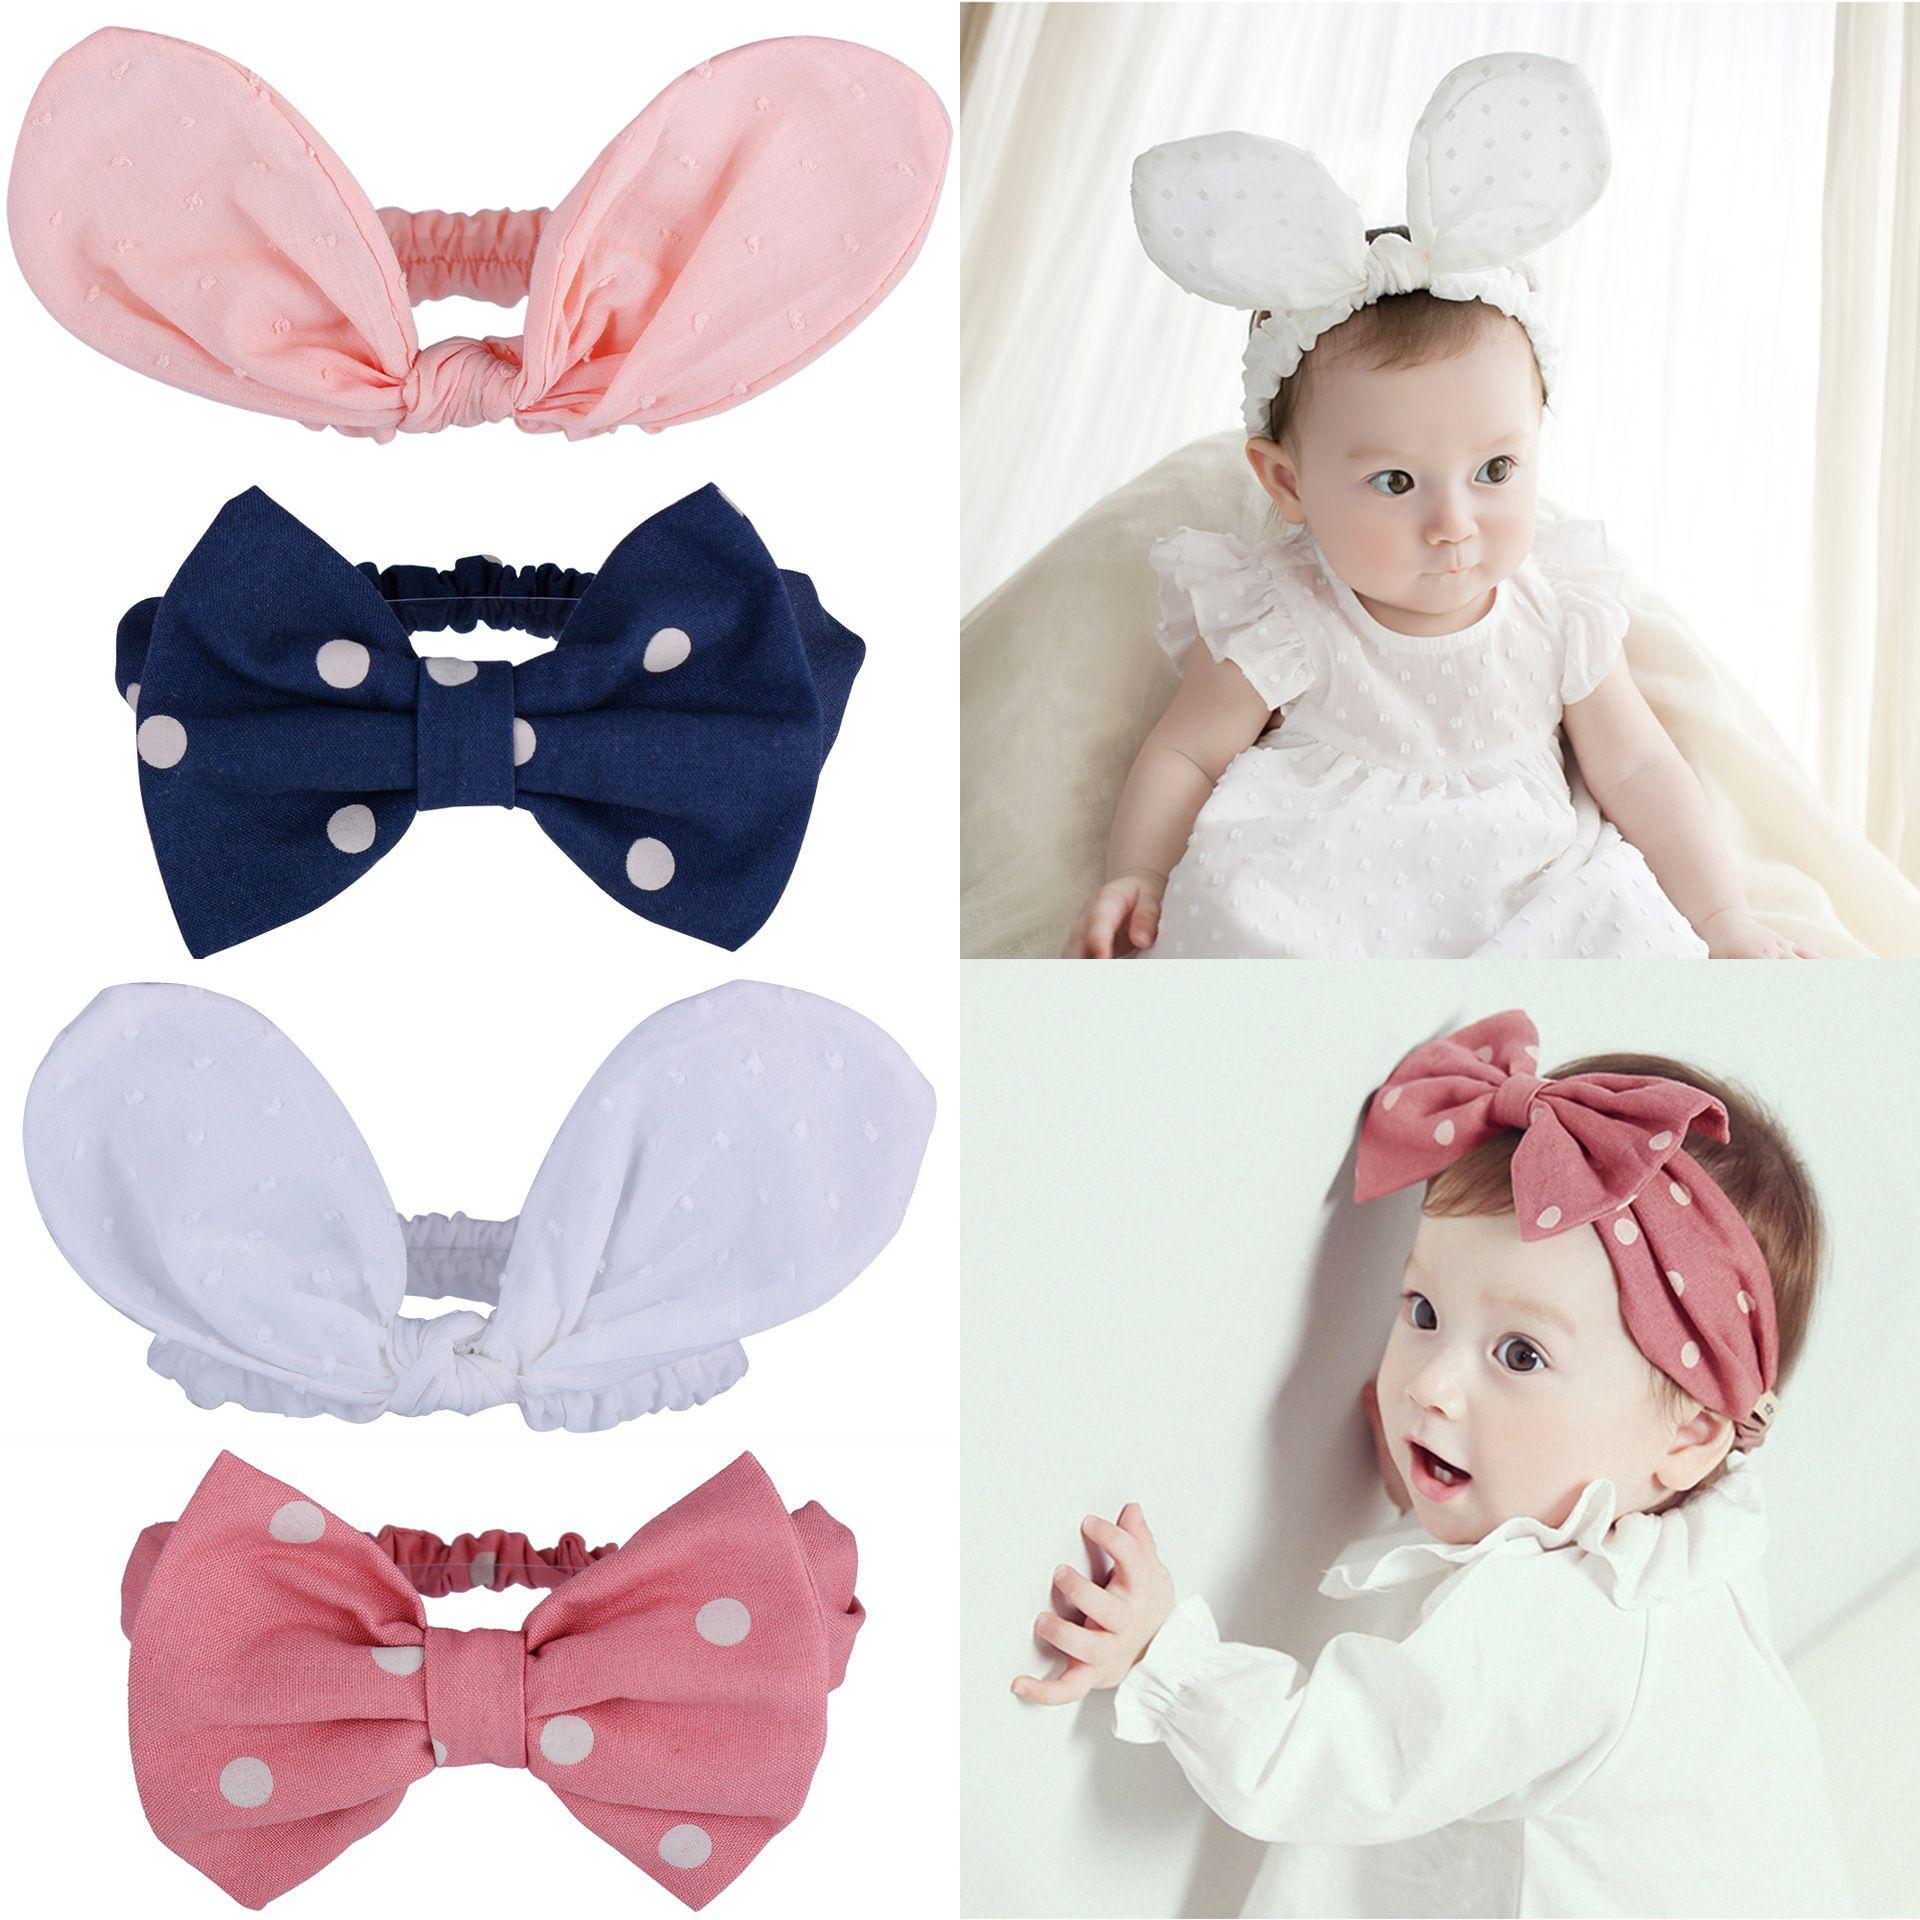 Baby Headbands Korean Girls Big Dot Bow Elastic Bunny Ear Headbands Children Kids Hair Accessories Cotton Turban Knot Hairbands KHA529